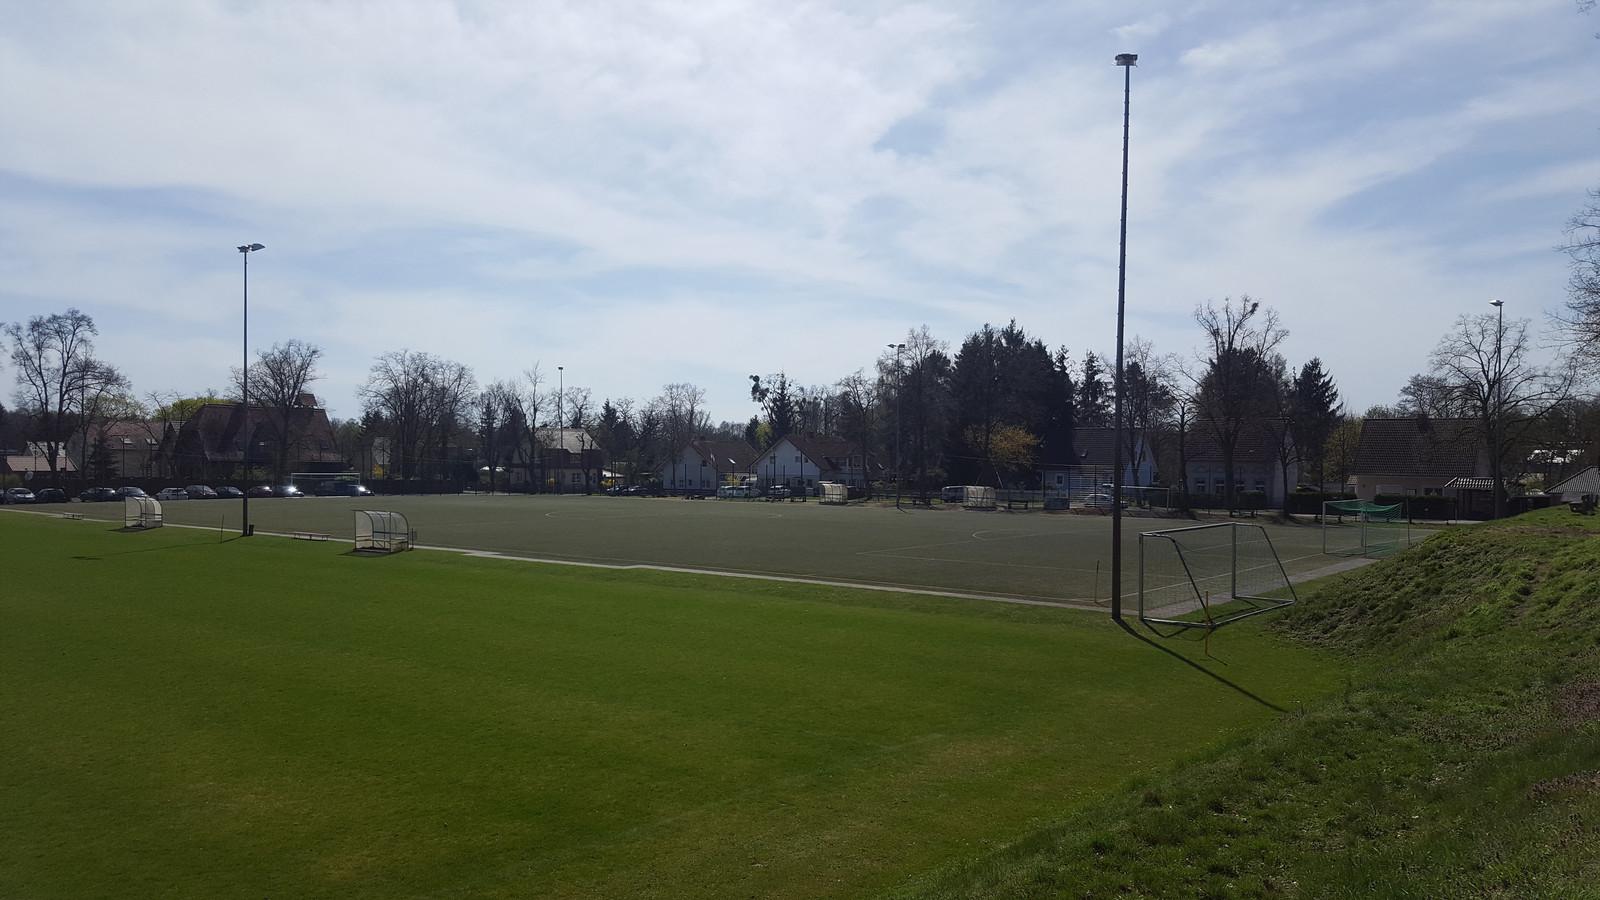 Sg 47 Bruchmühle  SG 47 Bruchmühle e V Fussball Verein